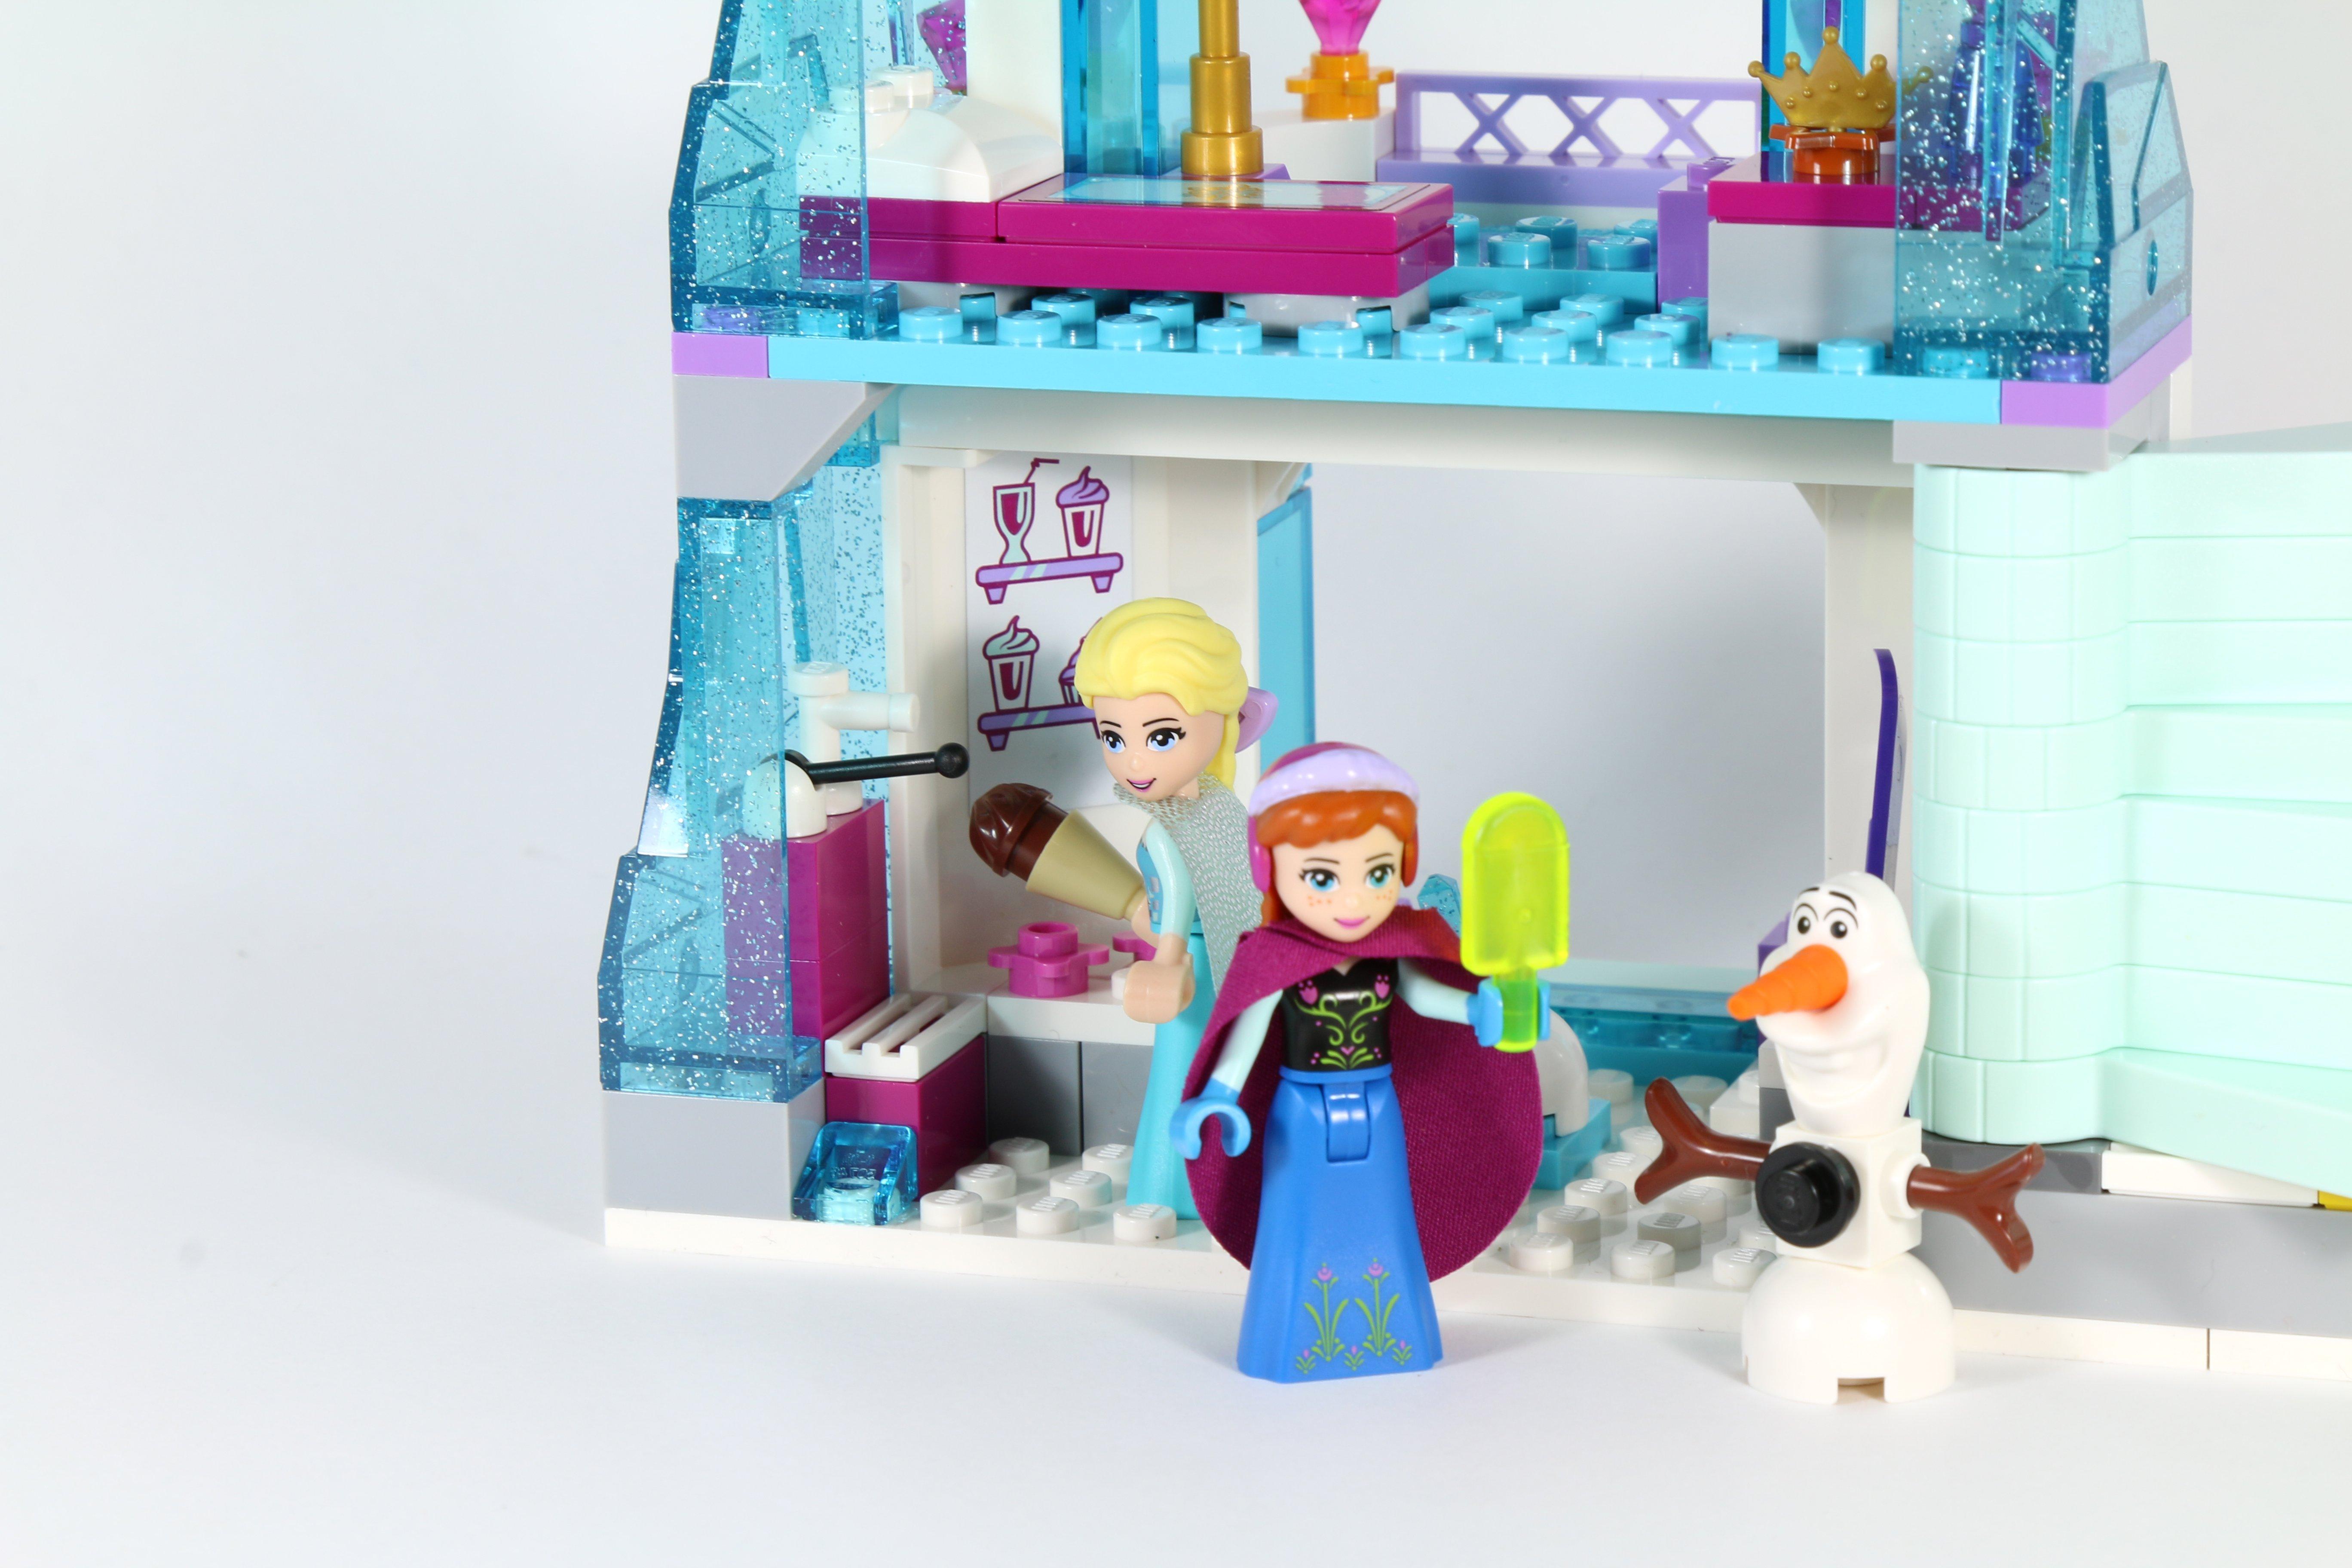 LEGO 41062 Elsa's Sparkling Ice Castle - Elsa and Anna Ice Cream